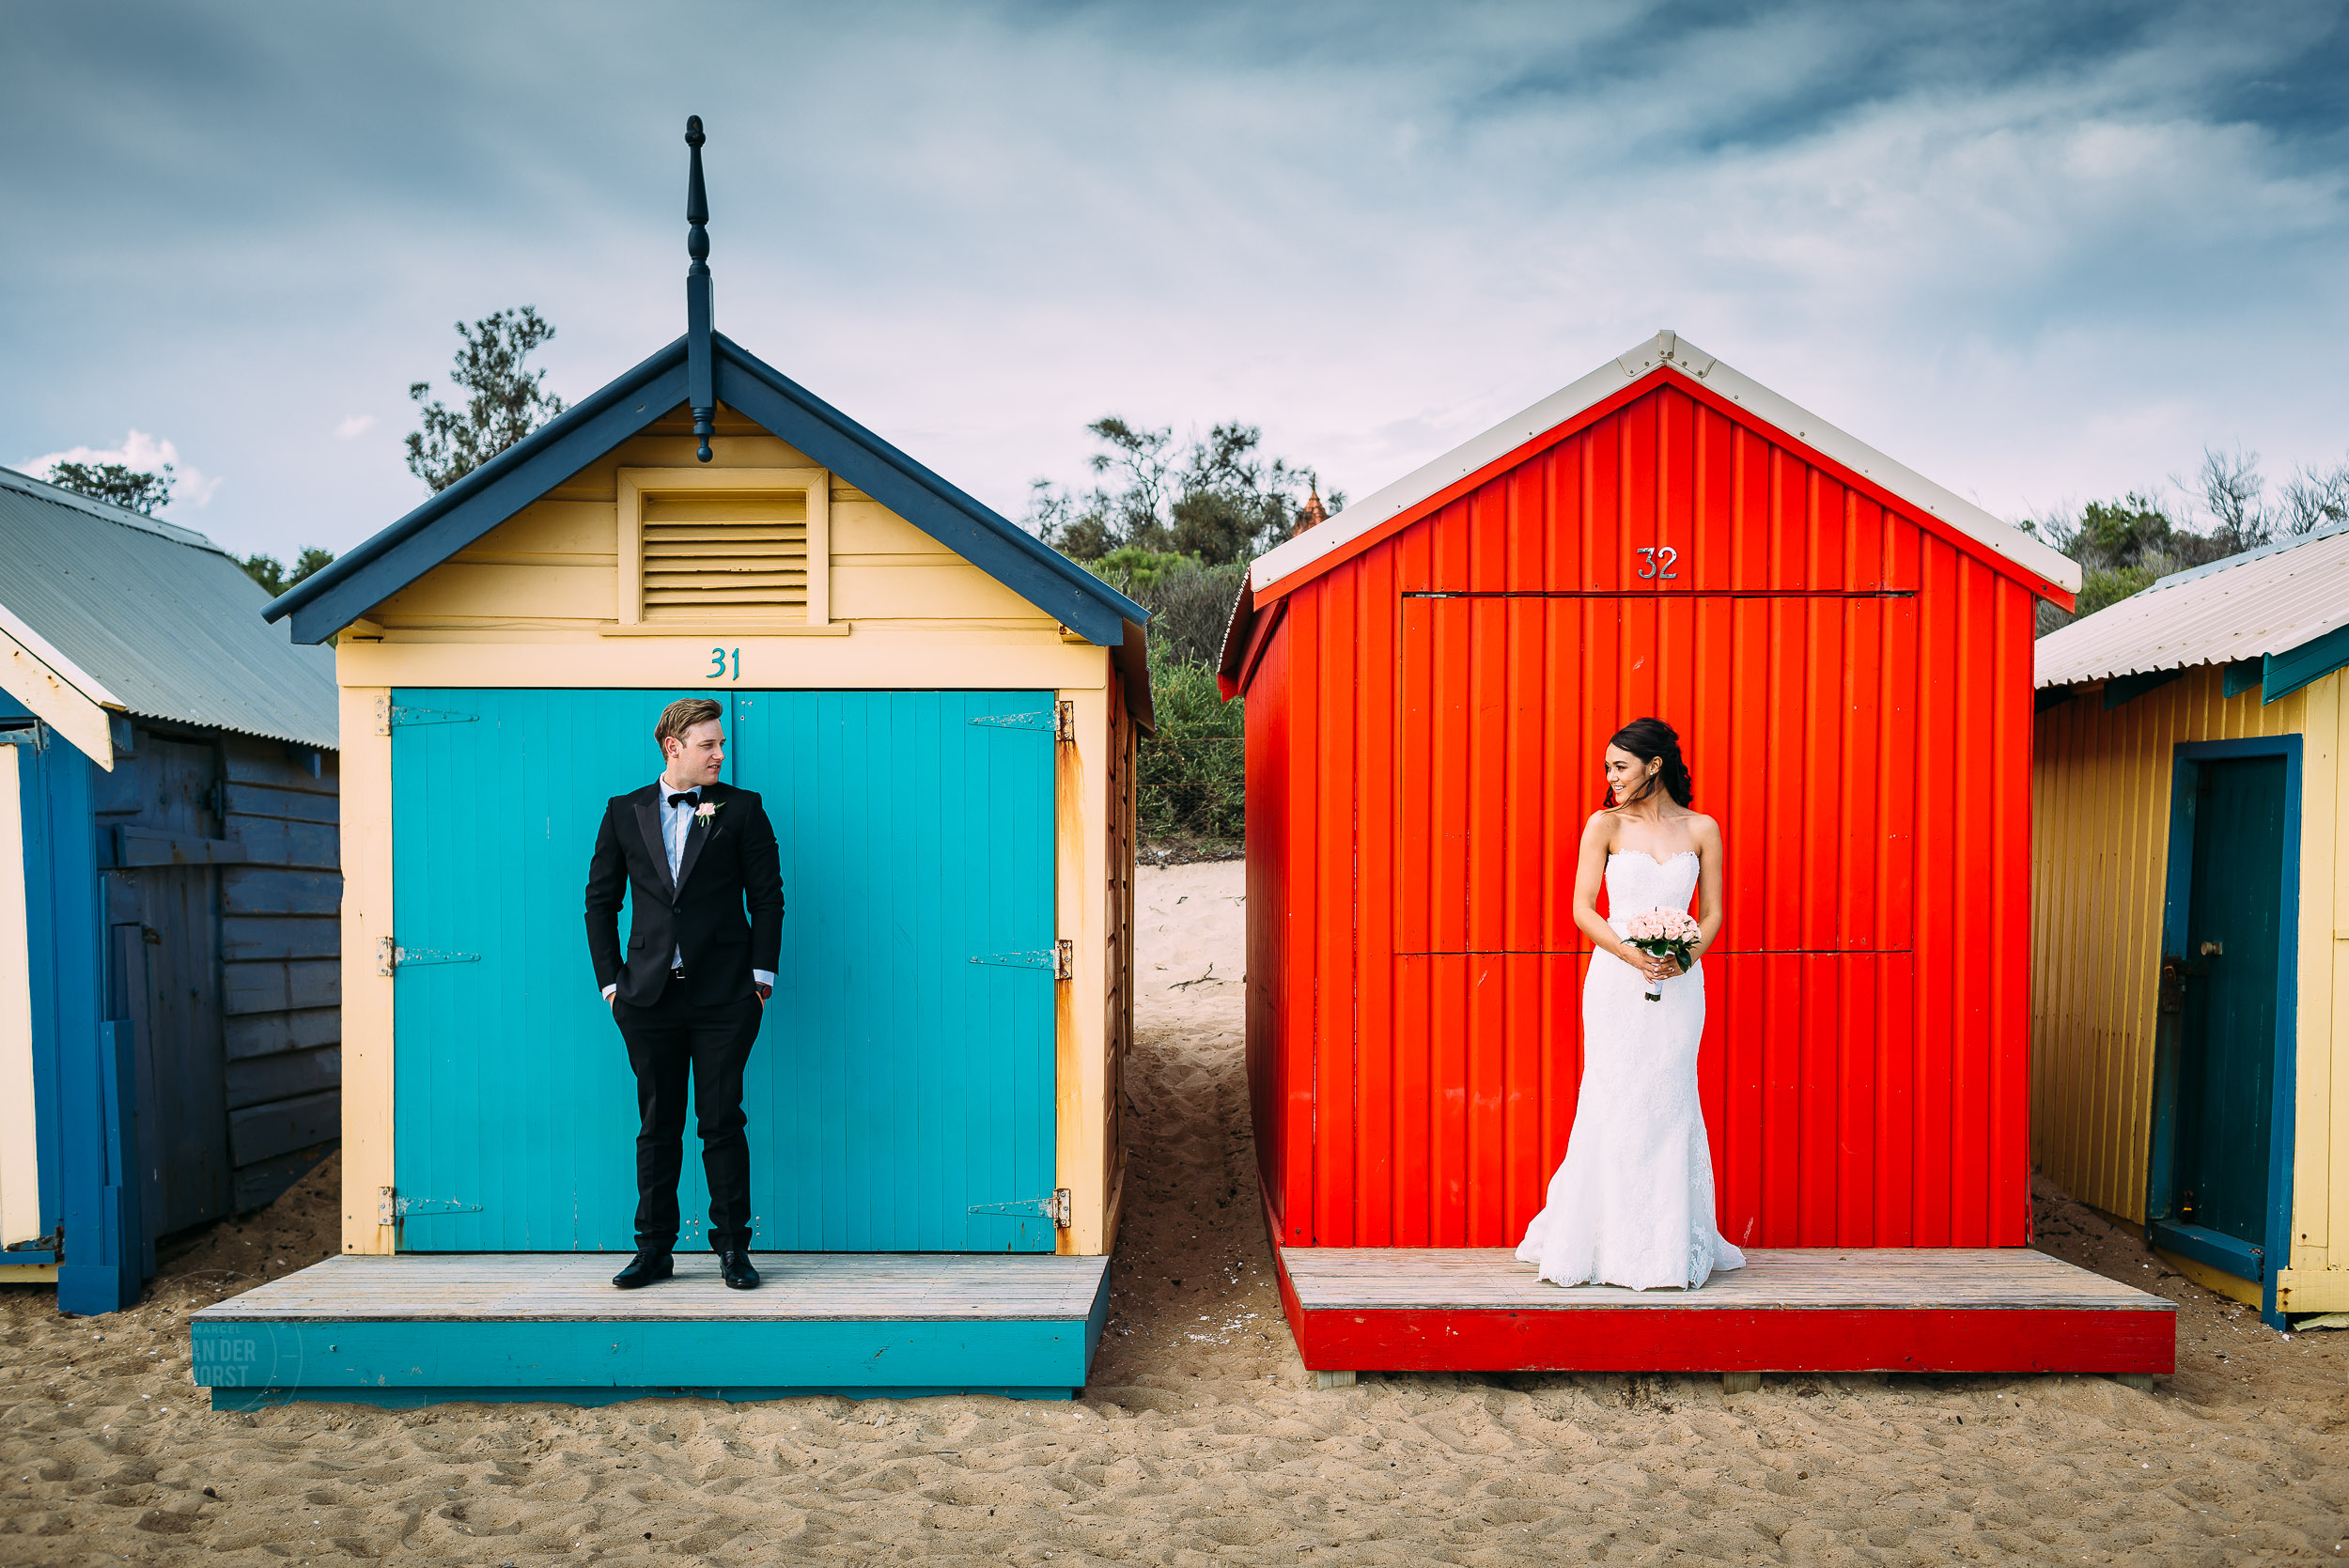 Melbourne-Wedding-Photographer-1075.jpg